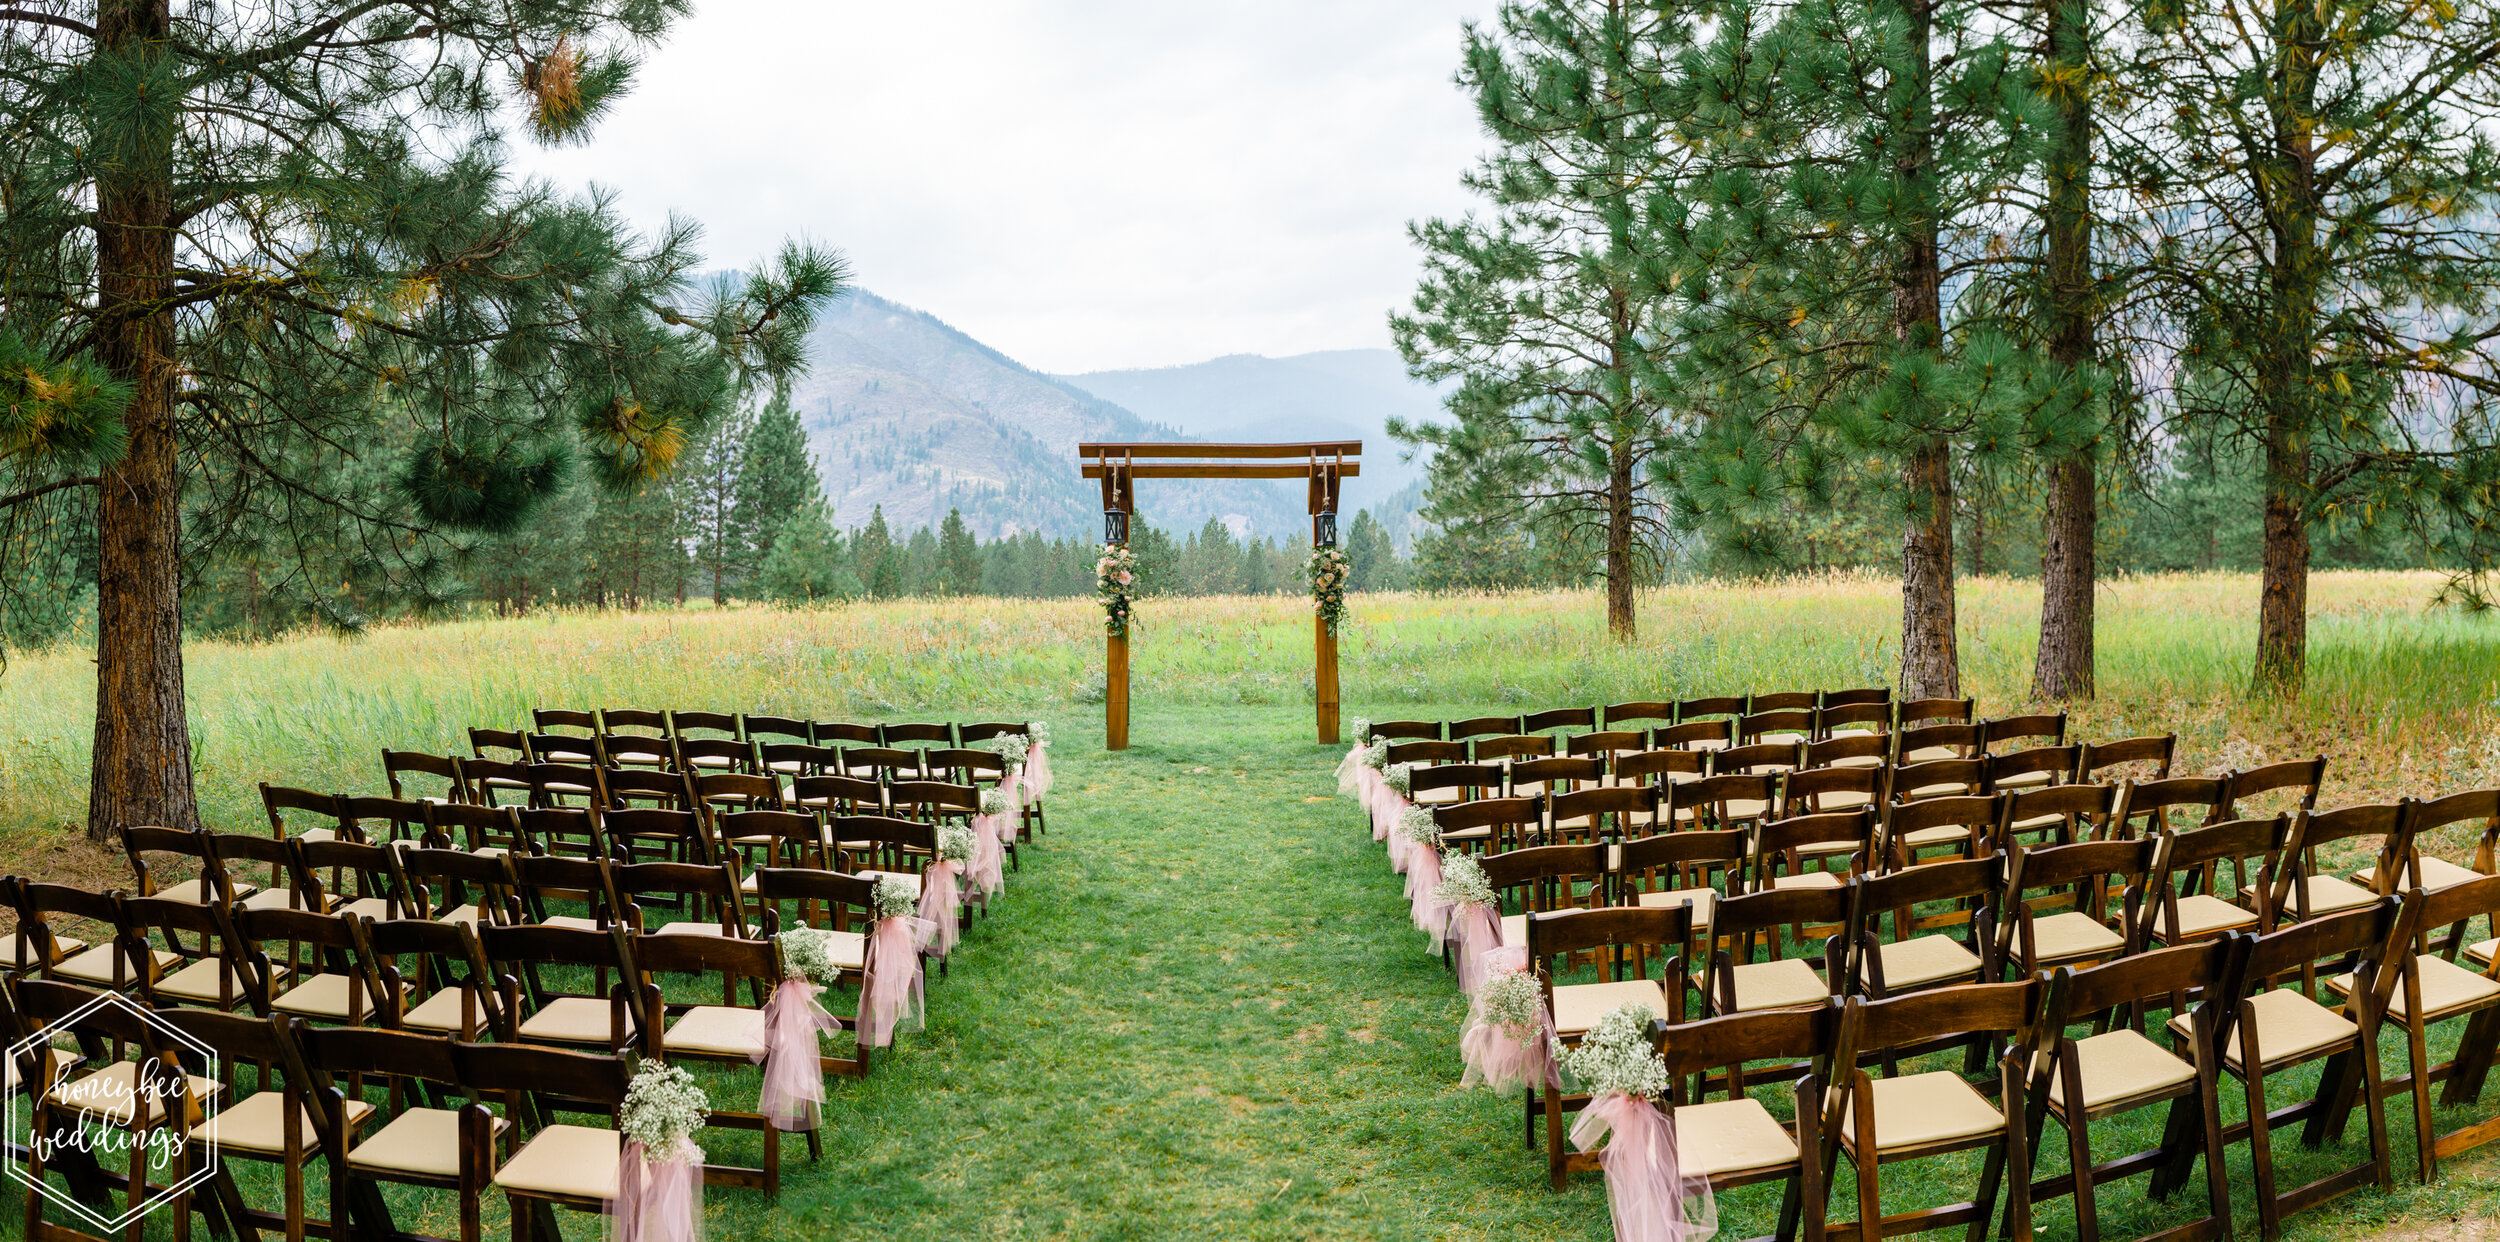 016White Raven Wedding_Montana Wedding Photographer_Corey & Corey_Honeybee Weddings_September 06, 2019-110-Pano.jpg